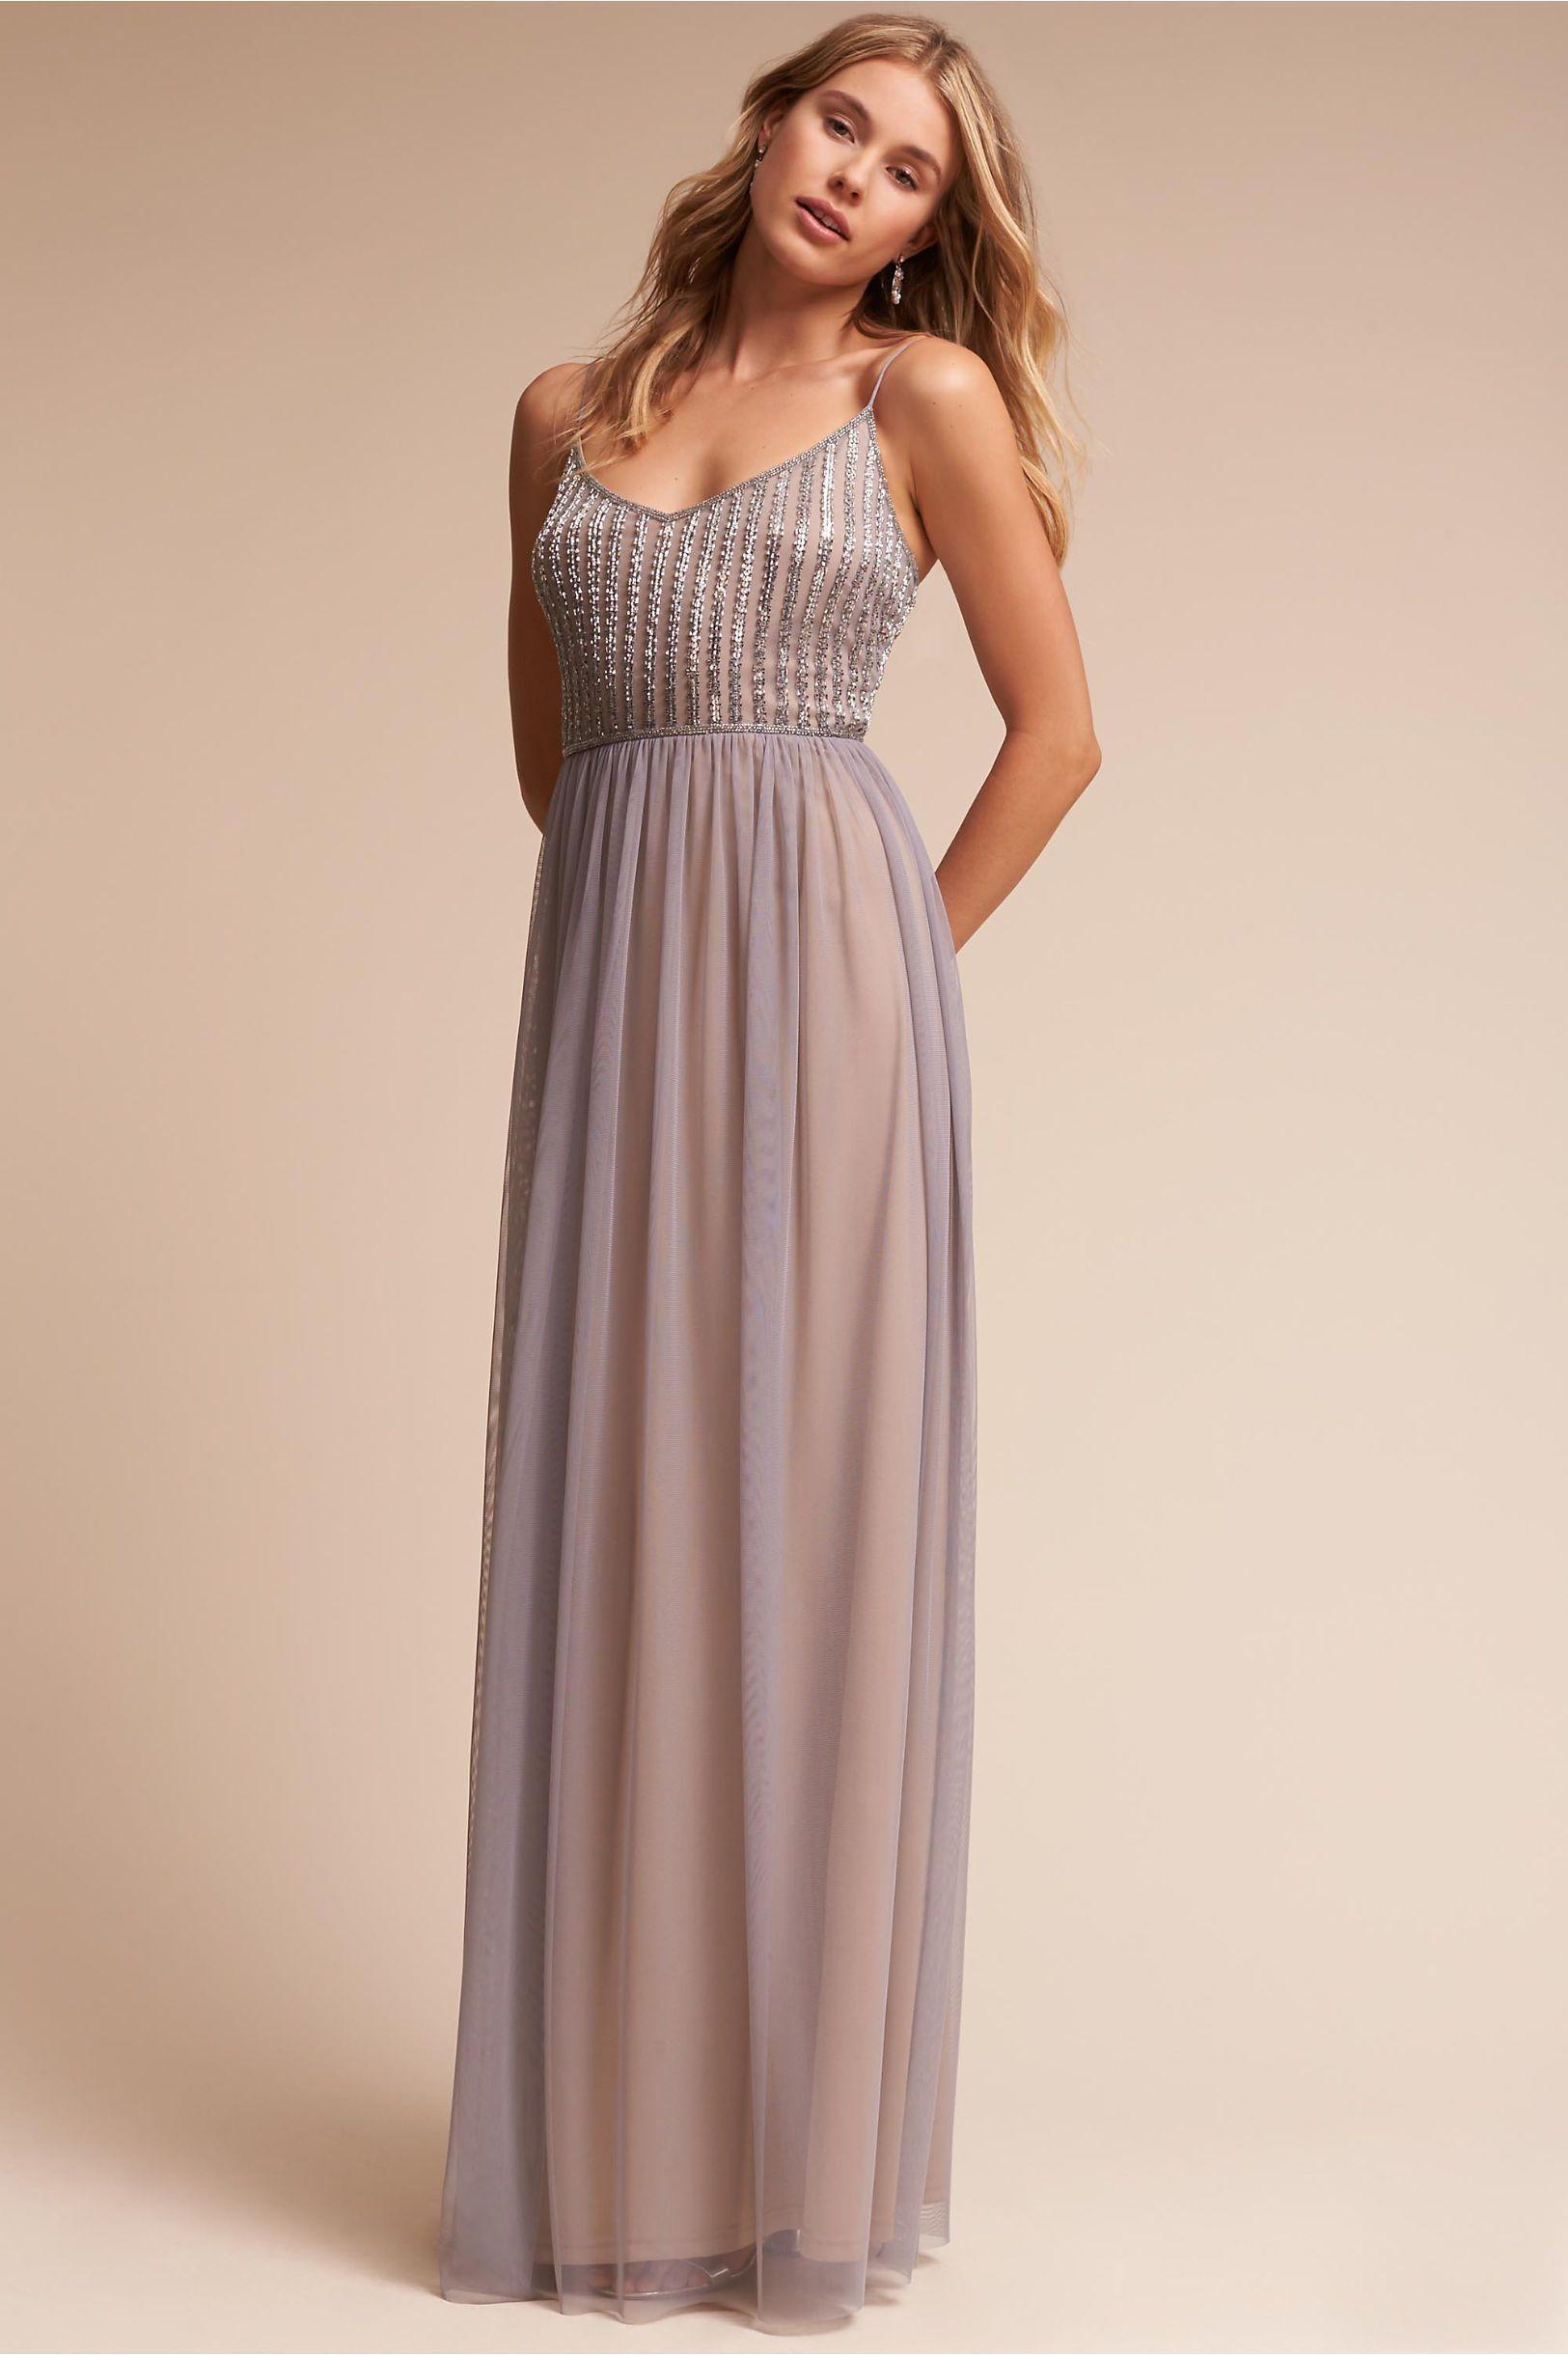 84fde12f823a BHLDN Silver Grey Laurent Dress in Bridal Party